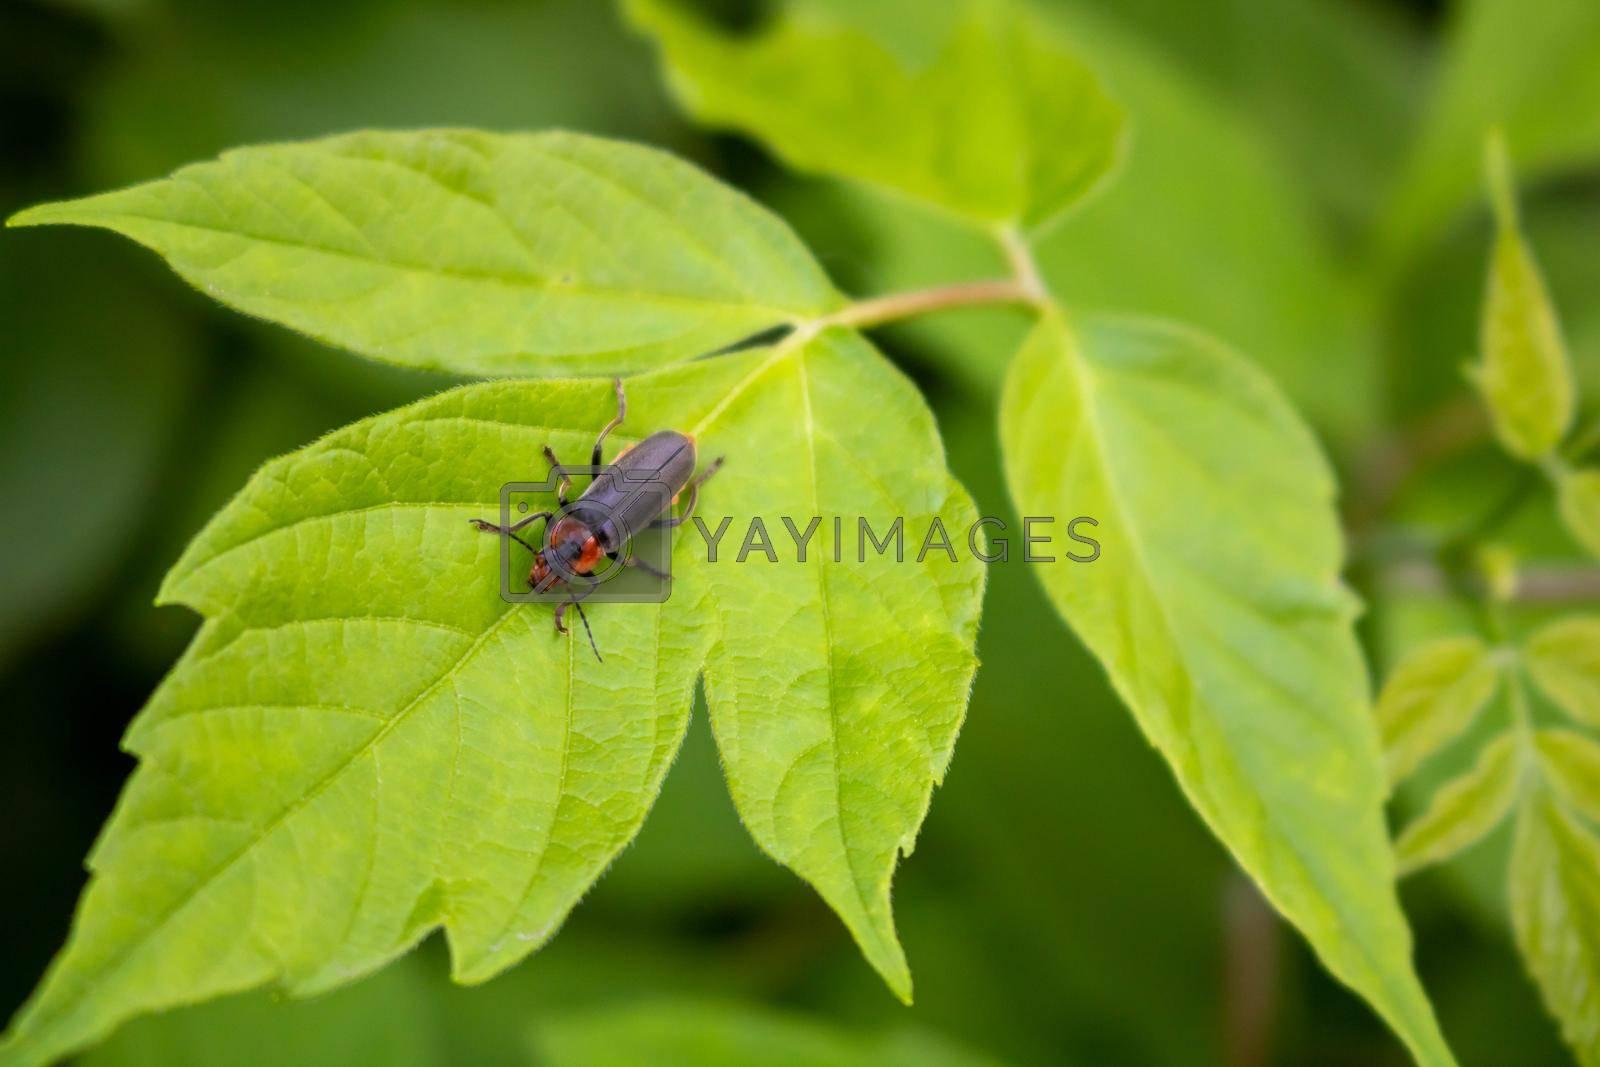 Fireman beetle on a green leaf.Summer day.